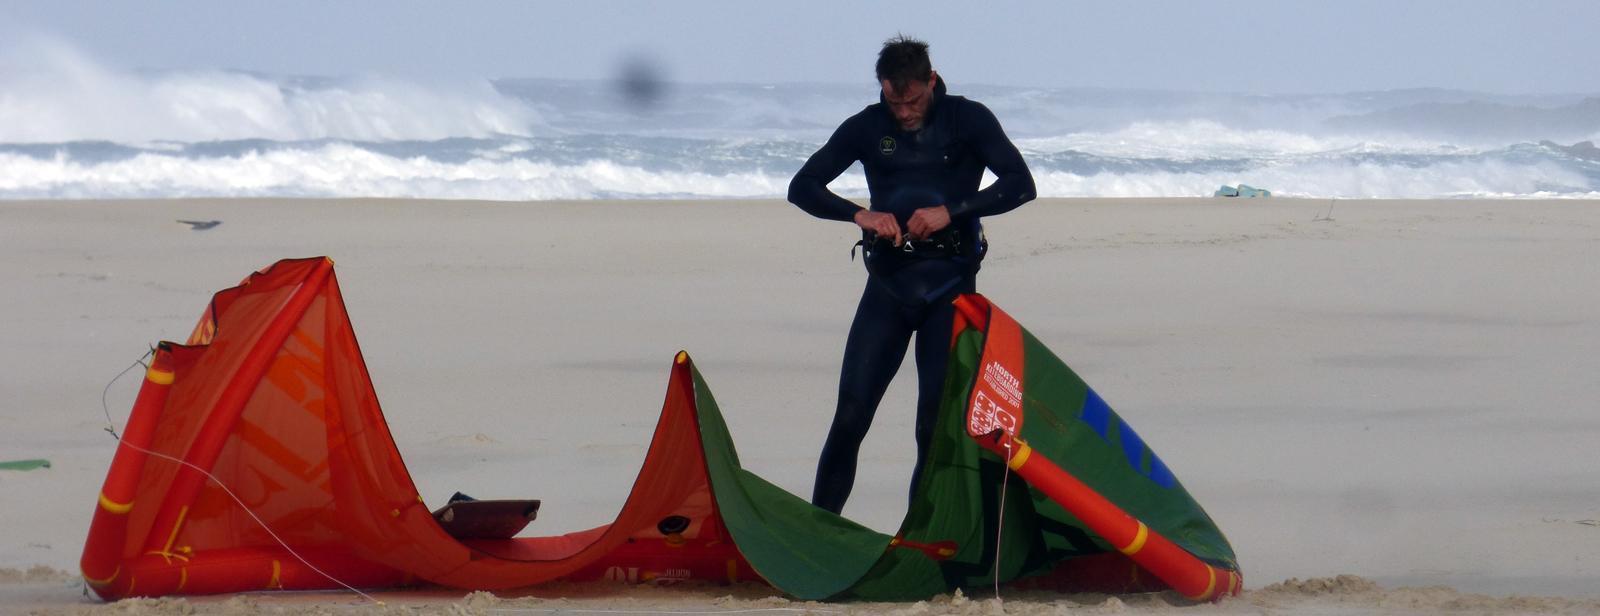 location de matériel de kitesurf en galice